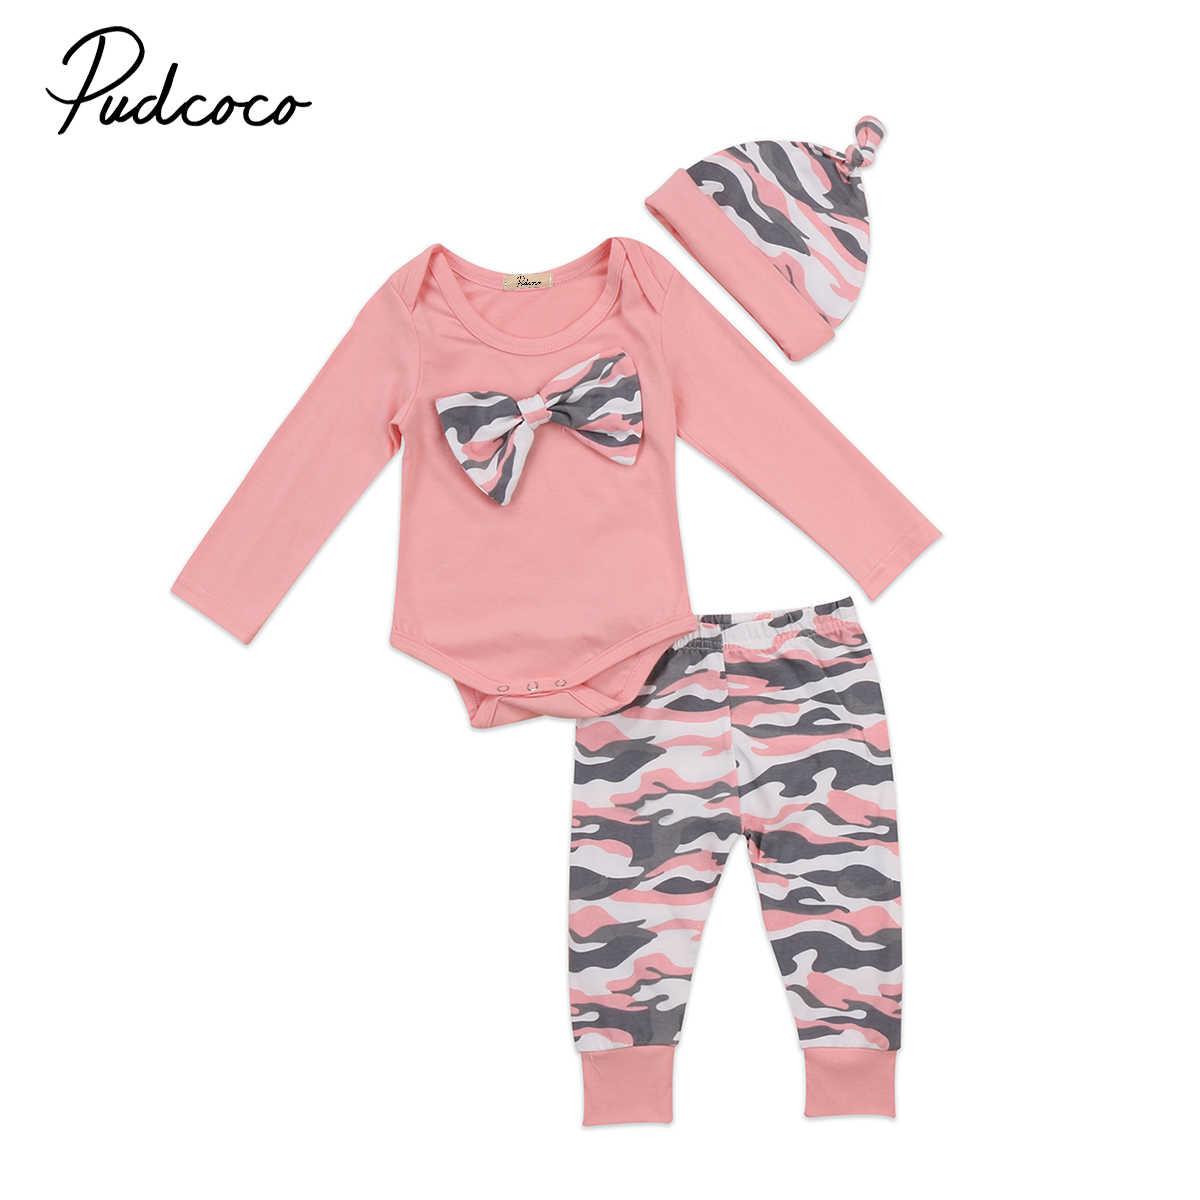 28c30bb9885 3PCS Cotton Newborn Baby Girls Boys Bow Tie Long Sleeve Romper Jumpsuit  Camo Long Pants Hat